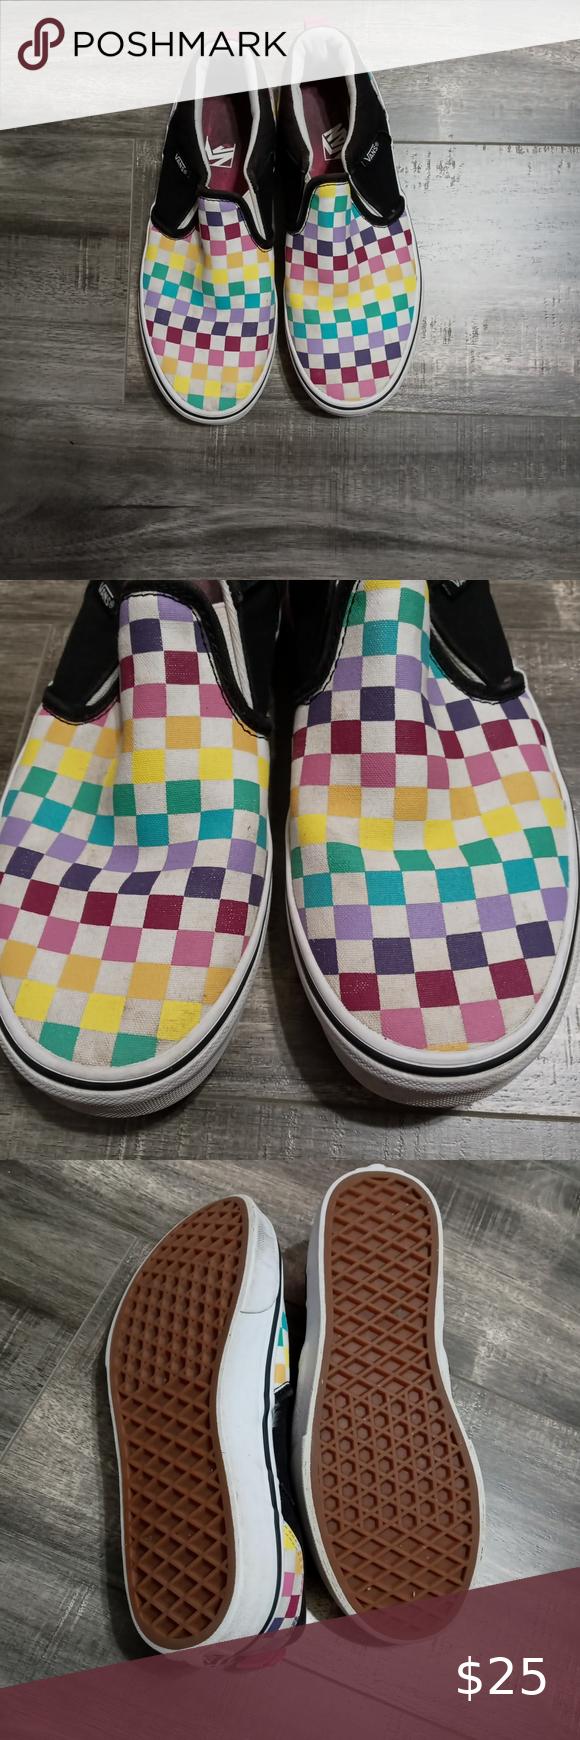 rainbow vans size 5